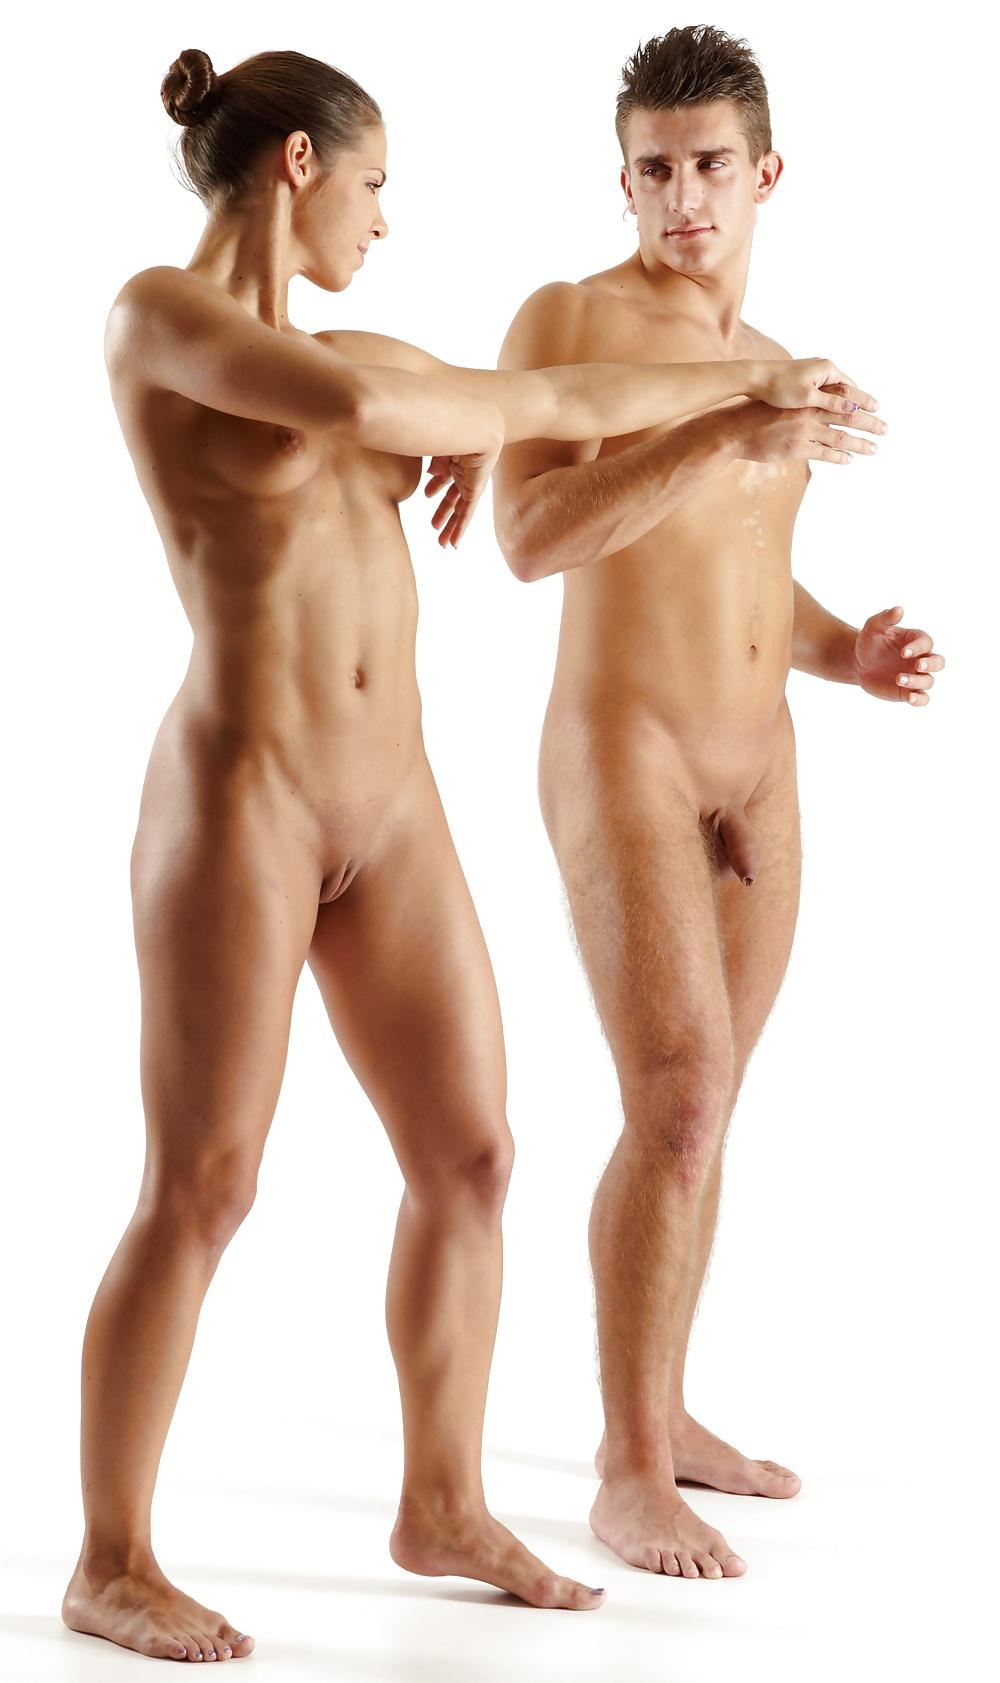 Human intercourse naked photos